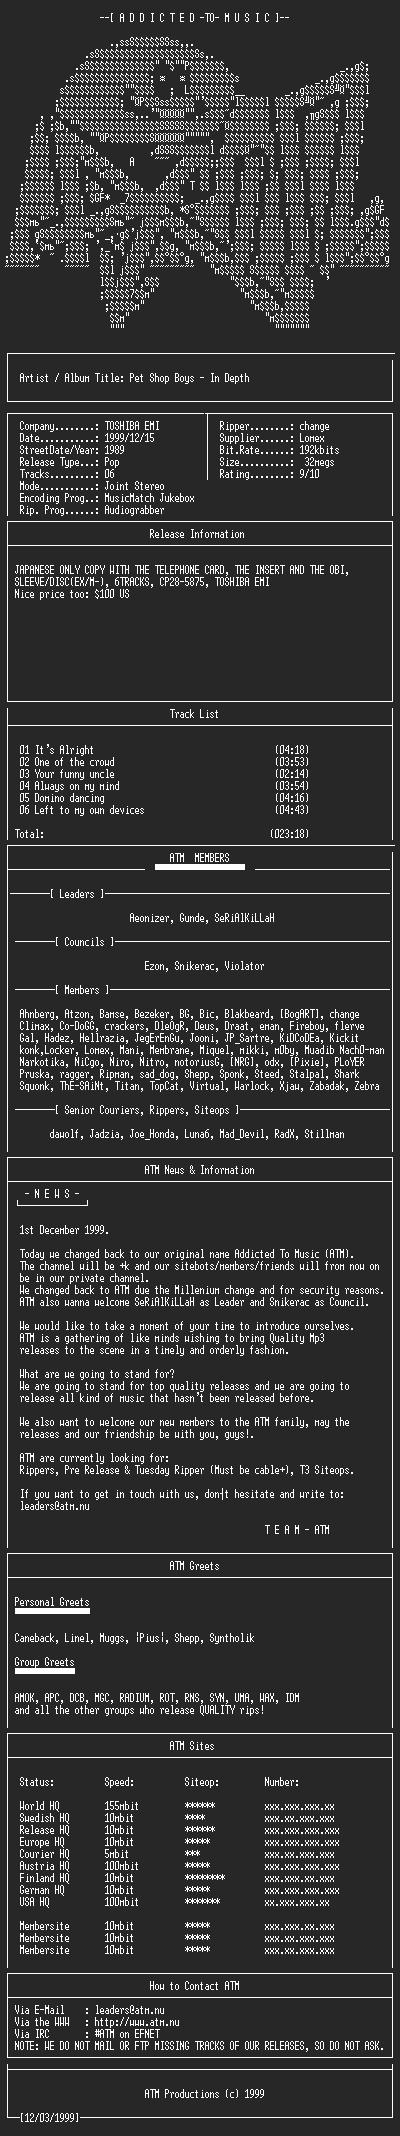 NFO file for Pet_Shop_Boys_-_In_depth_-_(1989)-ATM